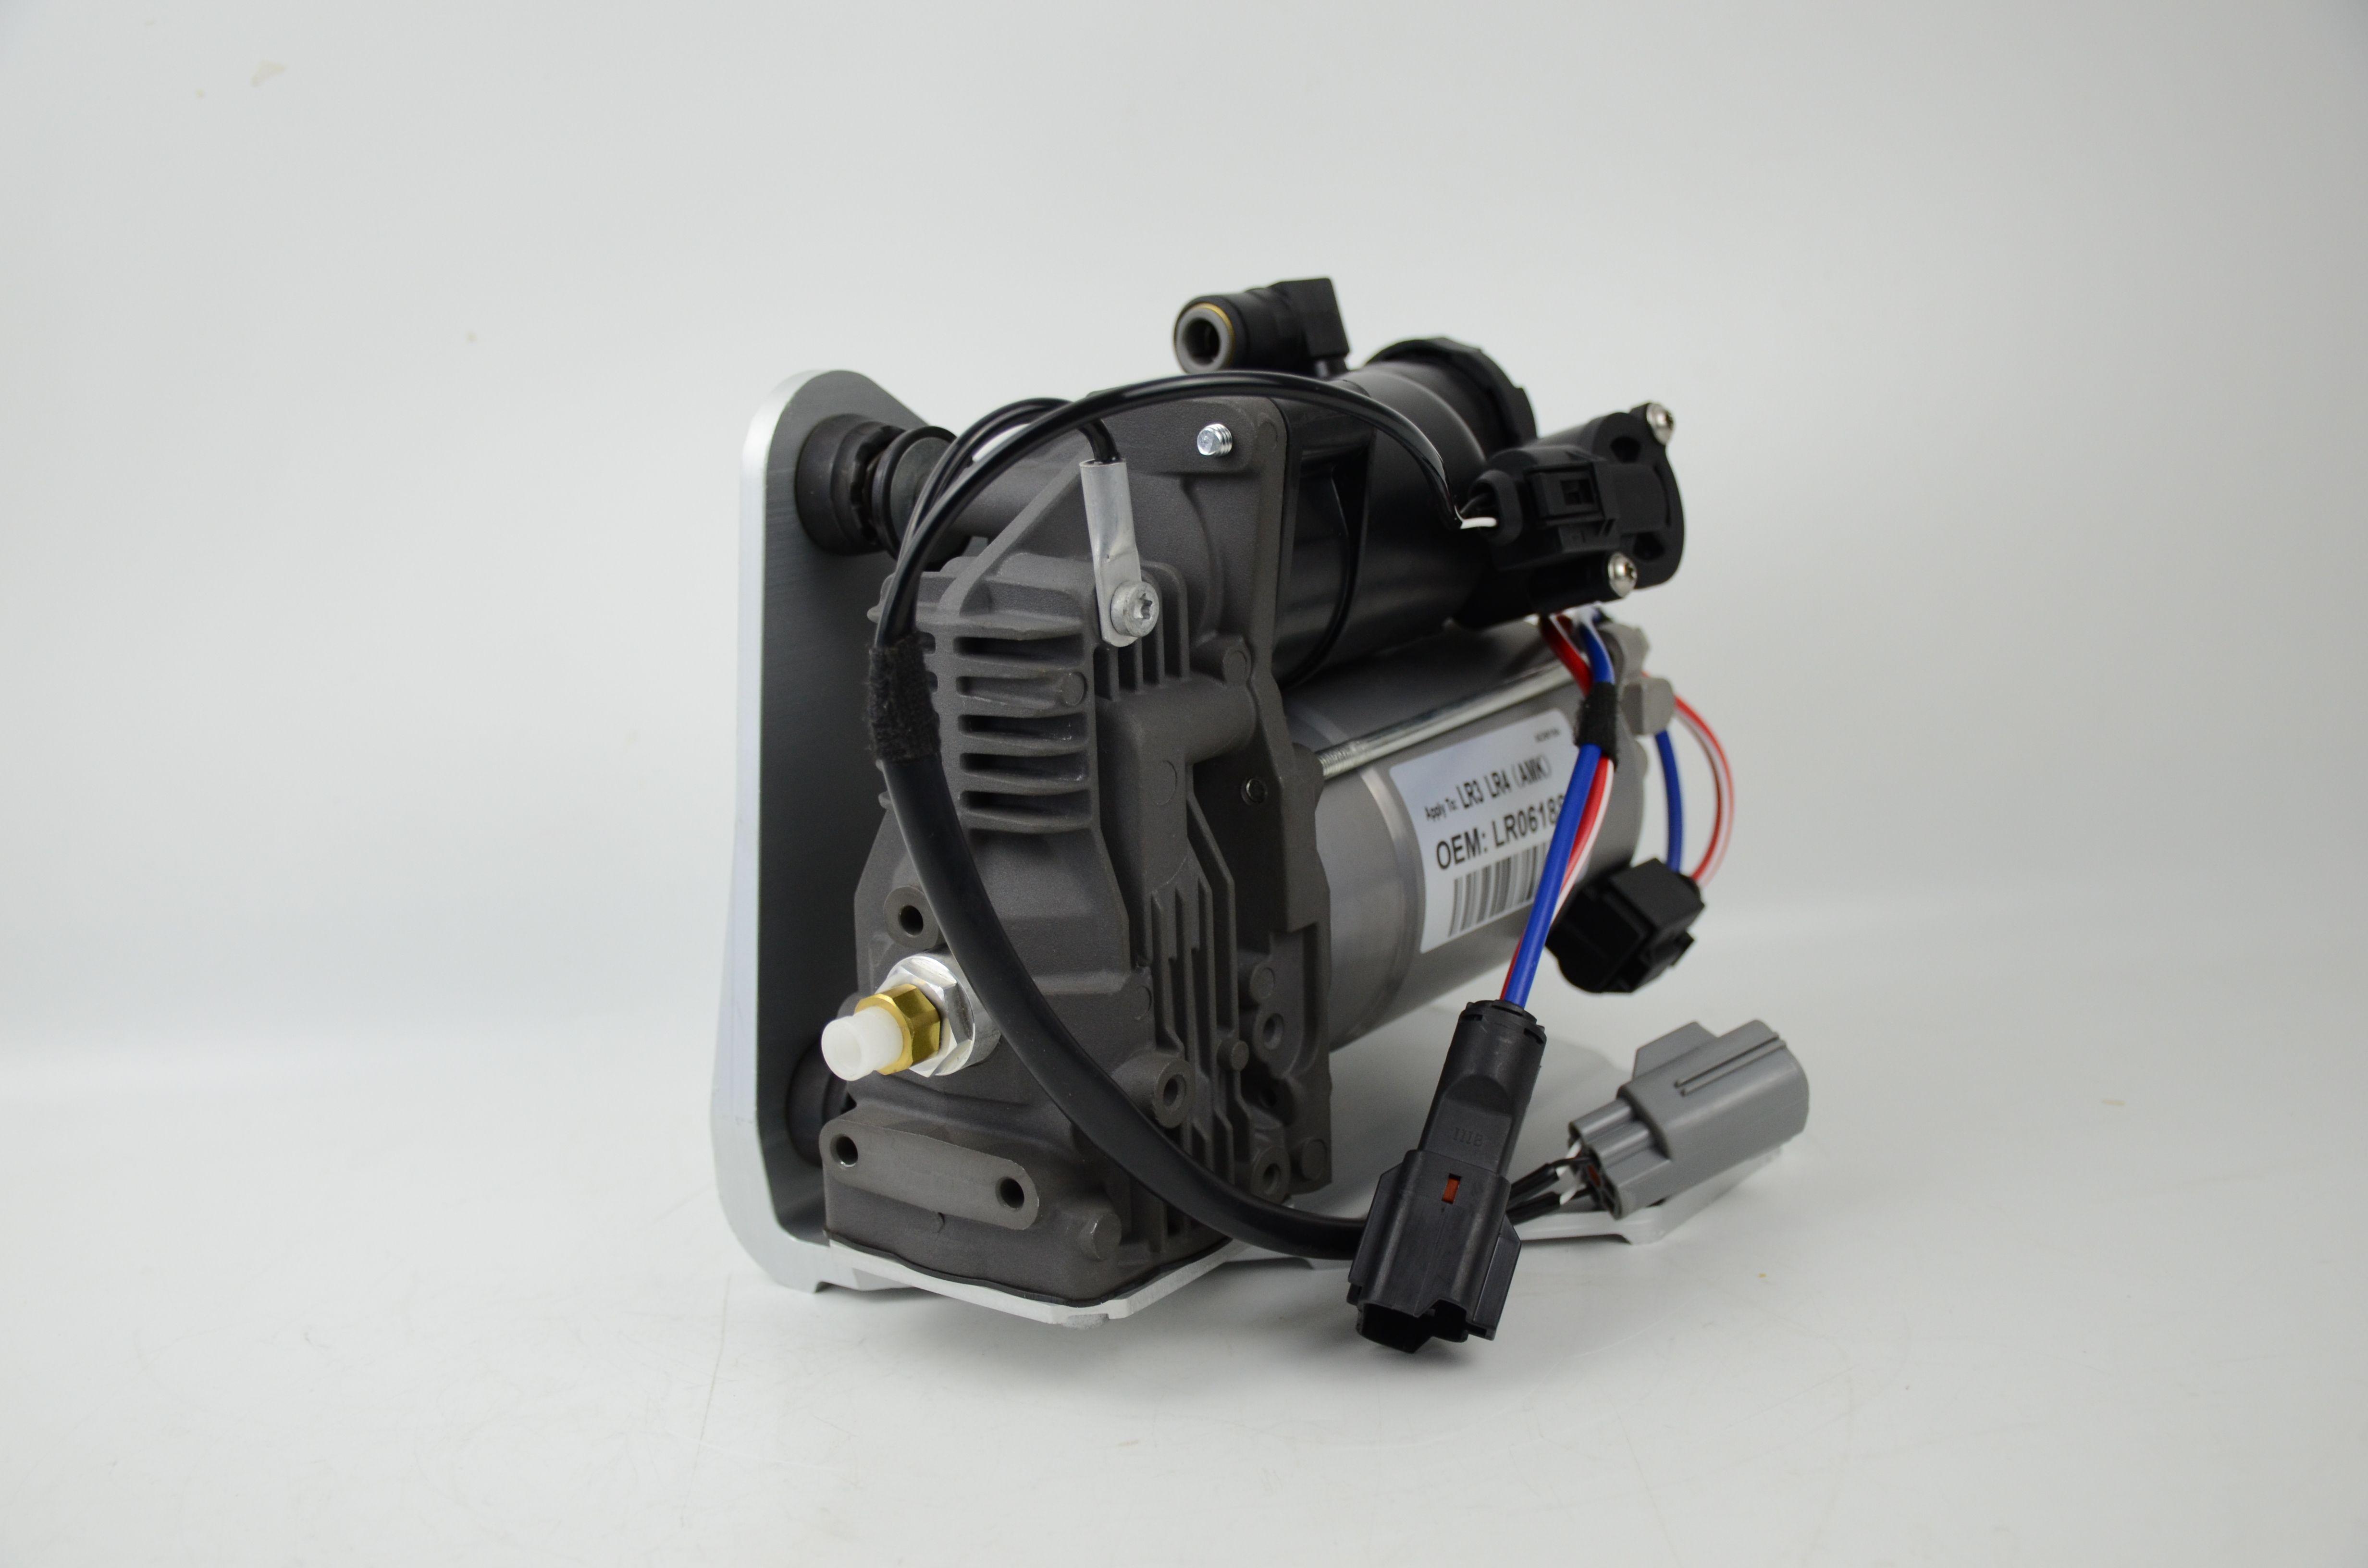 AMK Version Air Suspension Compressor Pump in 2020 Range